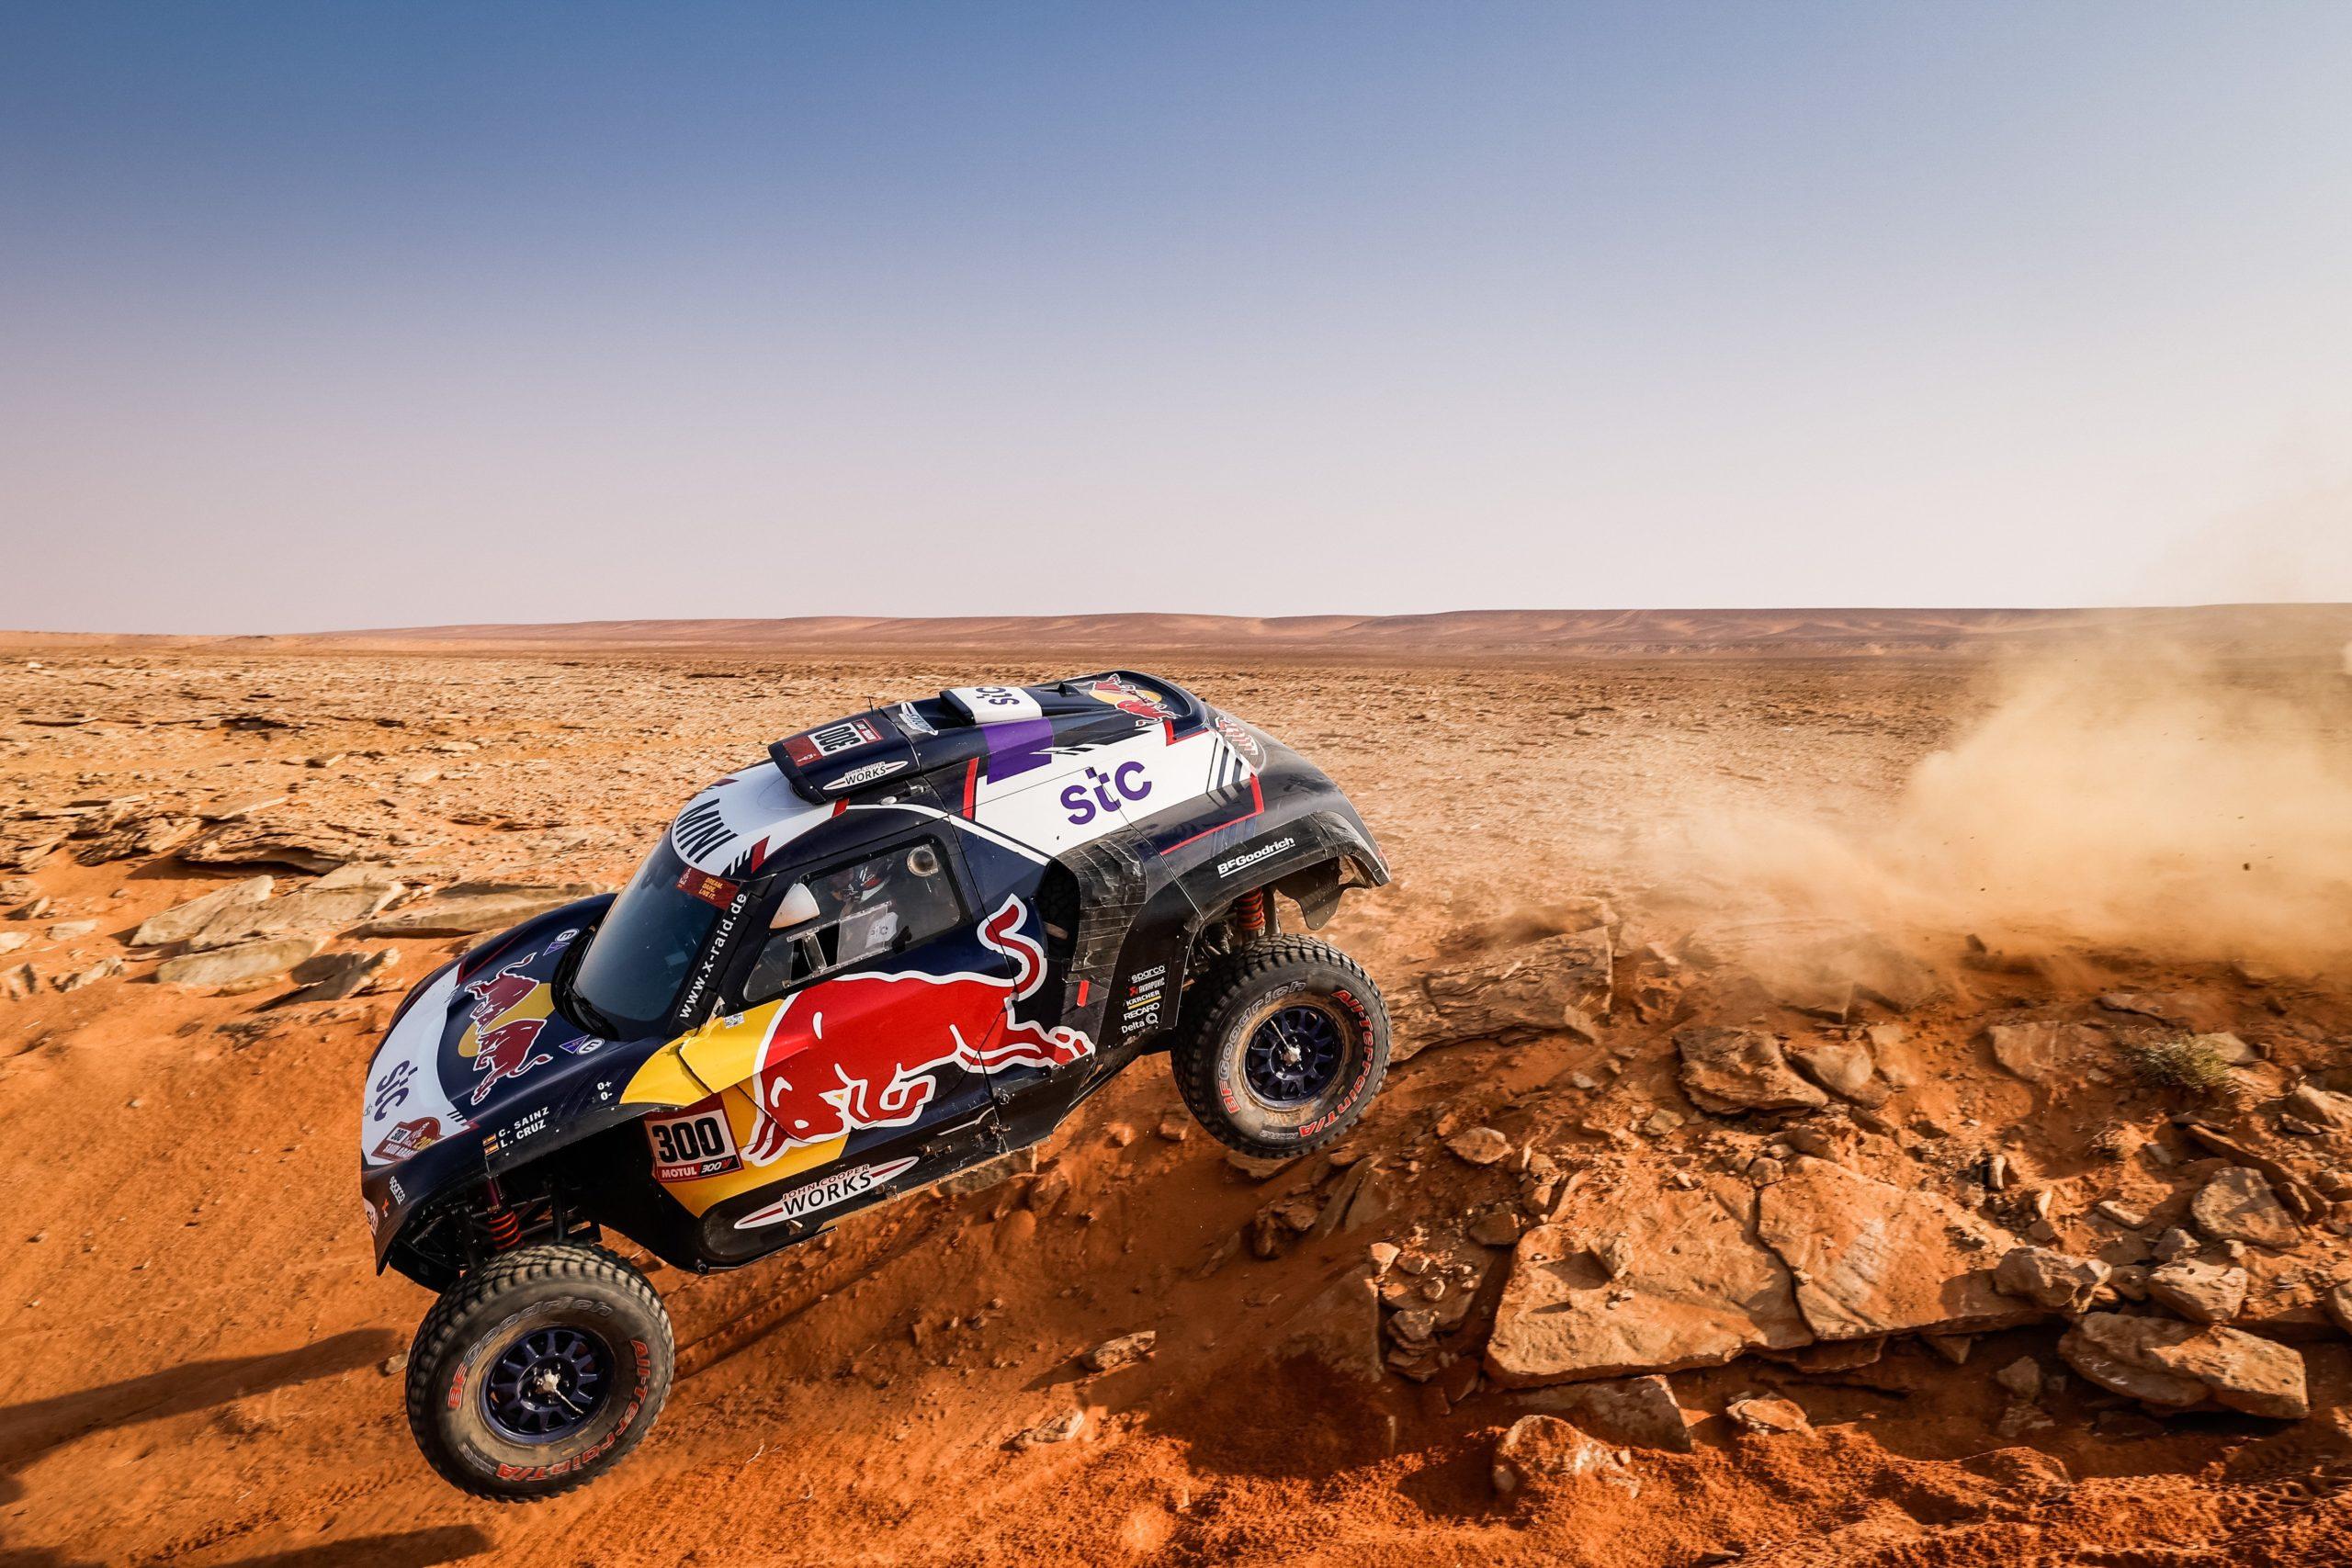 300 Sainz Carlos (esp), Cruz Lucas (esp), Mini, X-Raid Mini JCW Team, Auto, action during the 8th stage of the Dakar 2021 between Sakaka and Neom, in Saudi Arabia on January 11, 2021 - Photo Frédéric Le Floc'h / DPPI